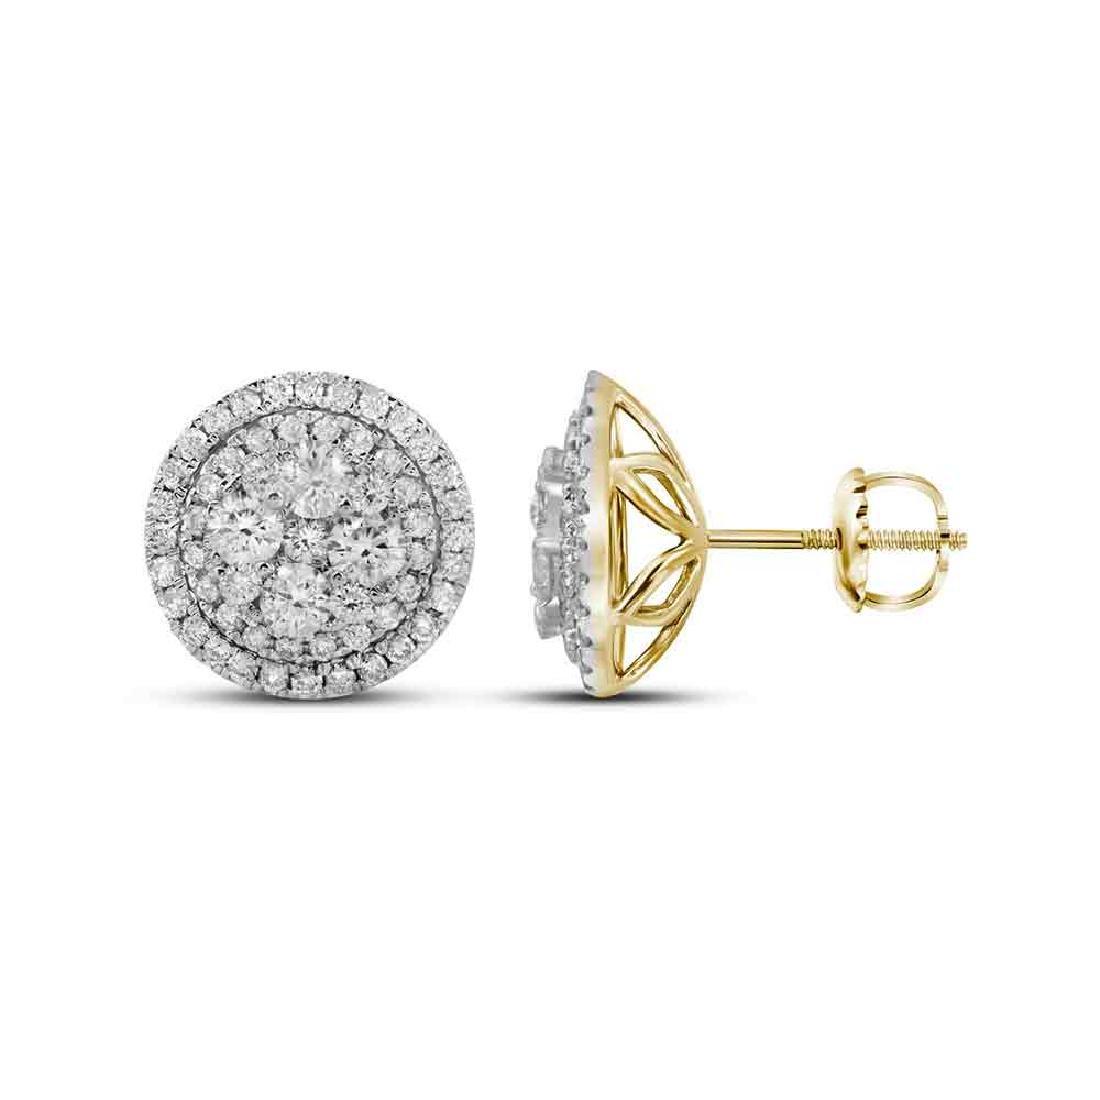 1.68 CTW Diamond Flower Cluster Earrings 14KT Yellow